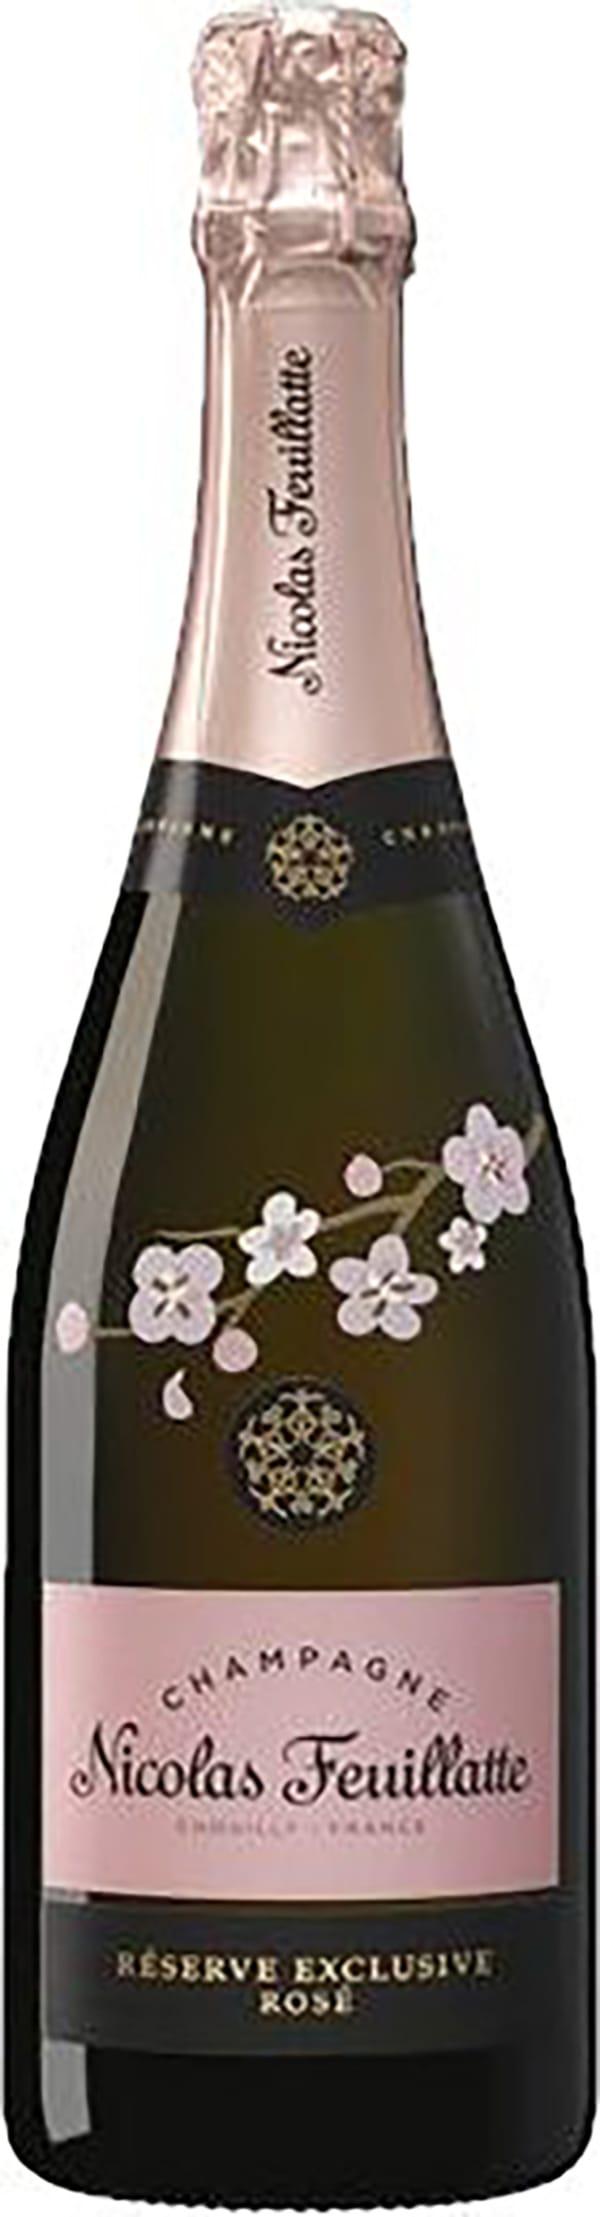 Nicolas Feuillatte Rosé Champagne Brut